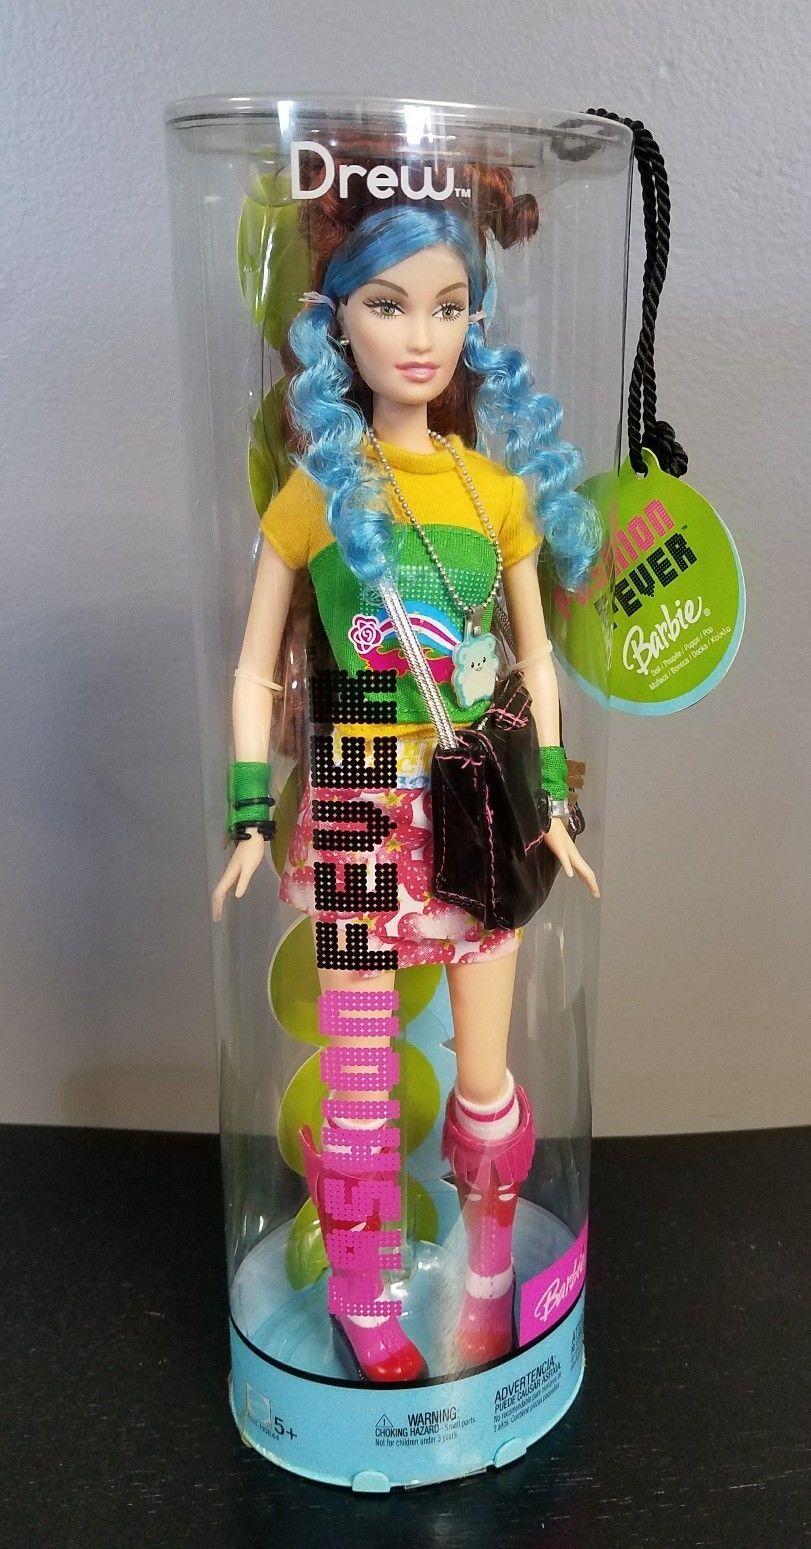 Barbie Fashion Fever Tokyo Pop DREW doll Mattel 2004 New